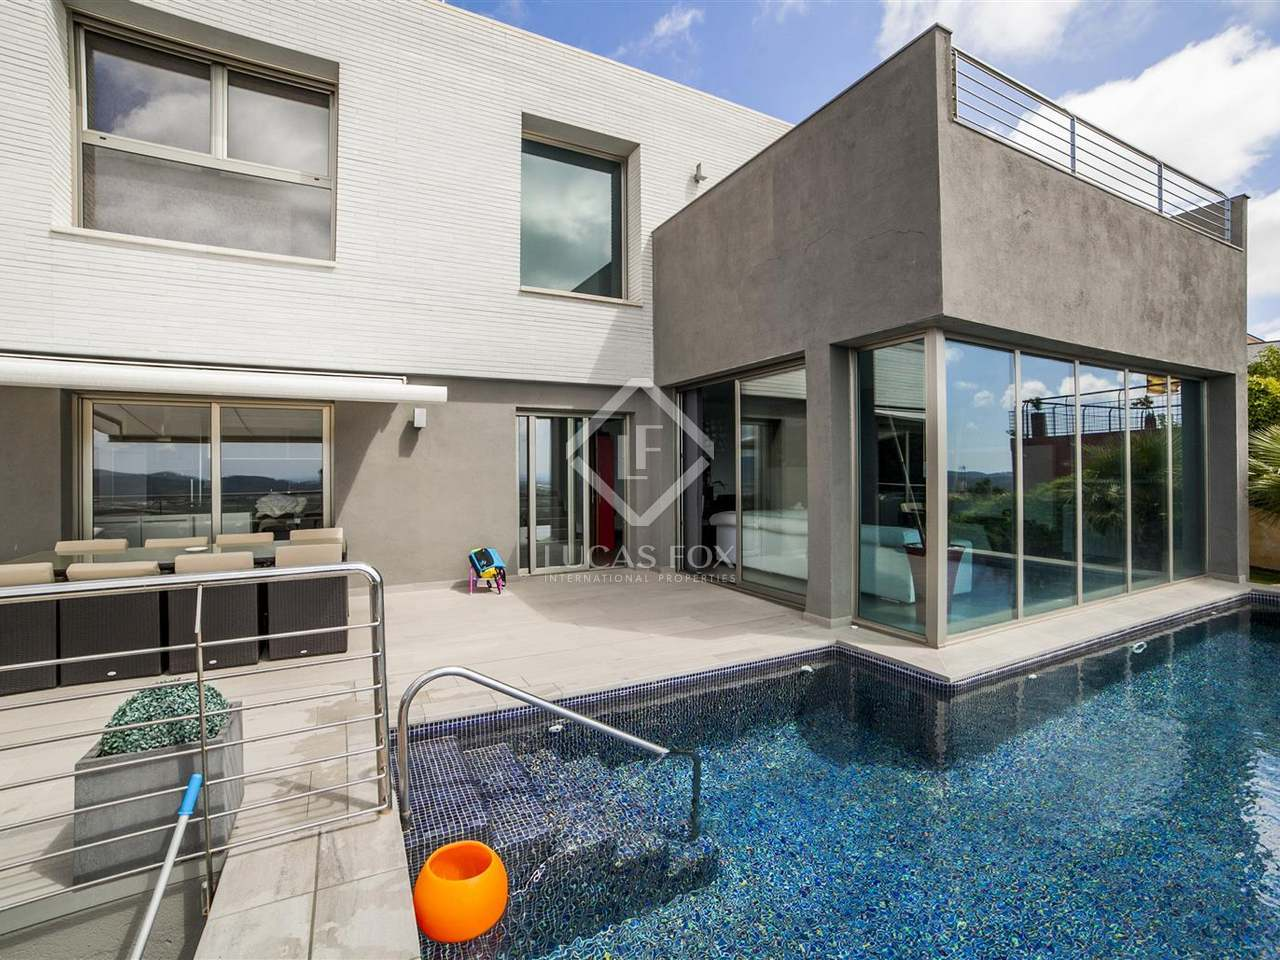 villa en vente sur la c te du maresme au nord de barcelone. Black Bedroom Furniture Sets. Home Design Ideas